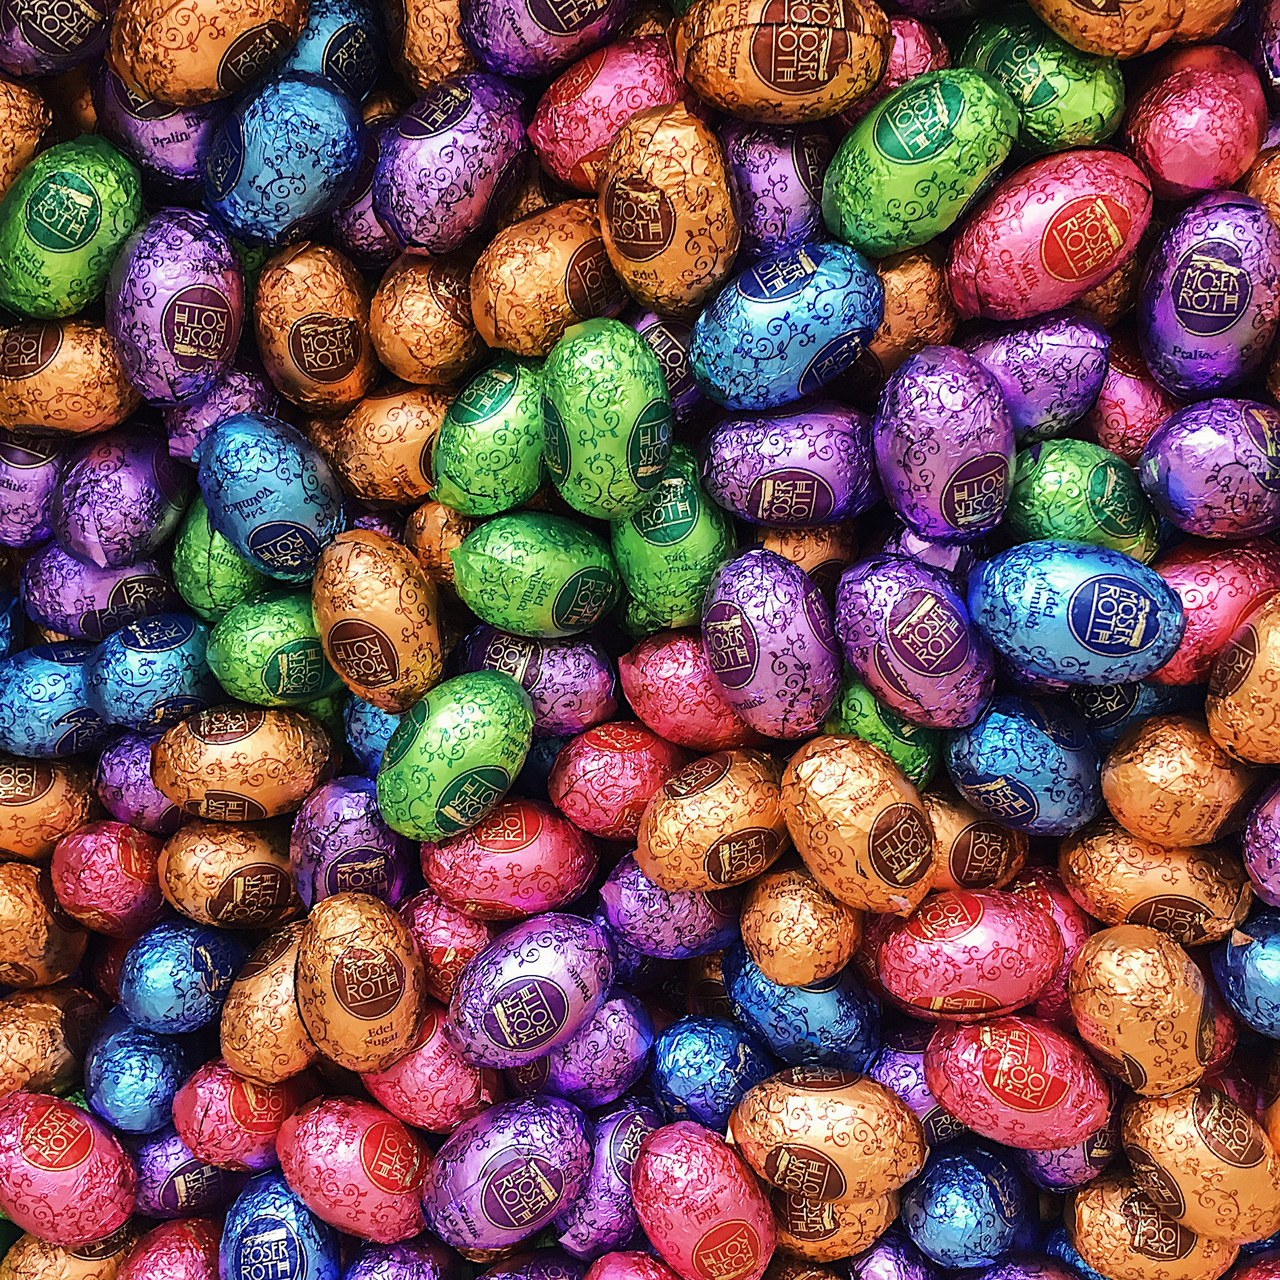 Яйца шоколадные Moser Roth (АССОРТИ)   1кг